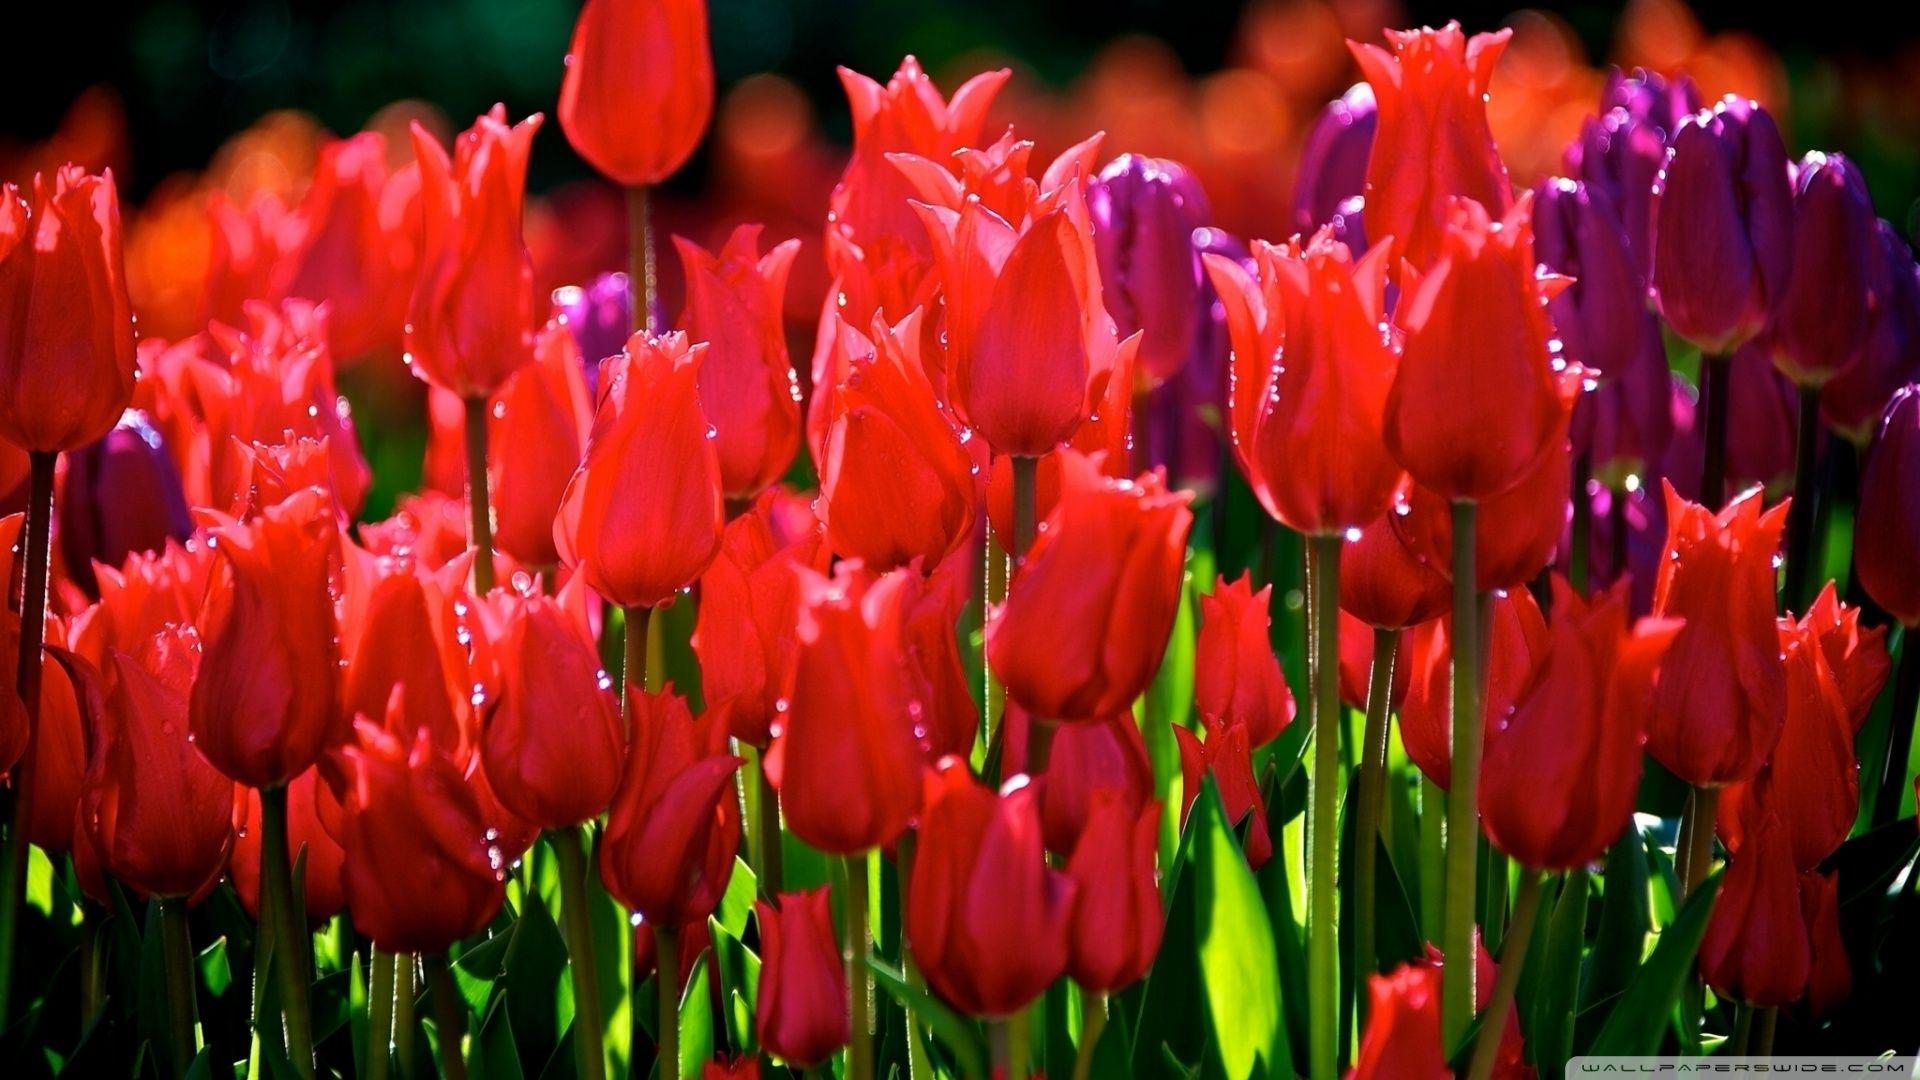 Tulips Hd Desktop Wallpaper High Definition Fullscreen Mobile Red Tulips Tulips Wallpaper Pictures